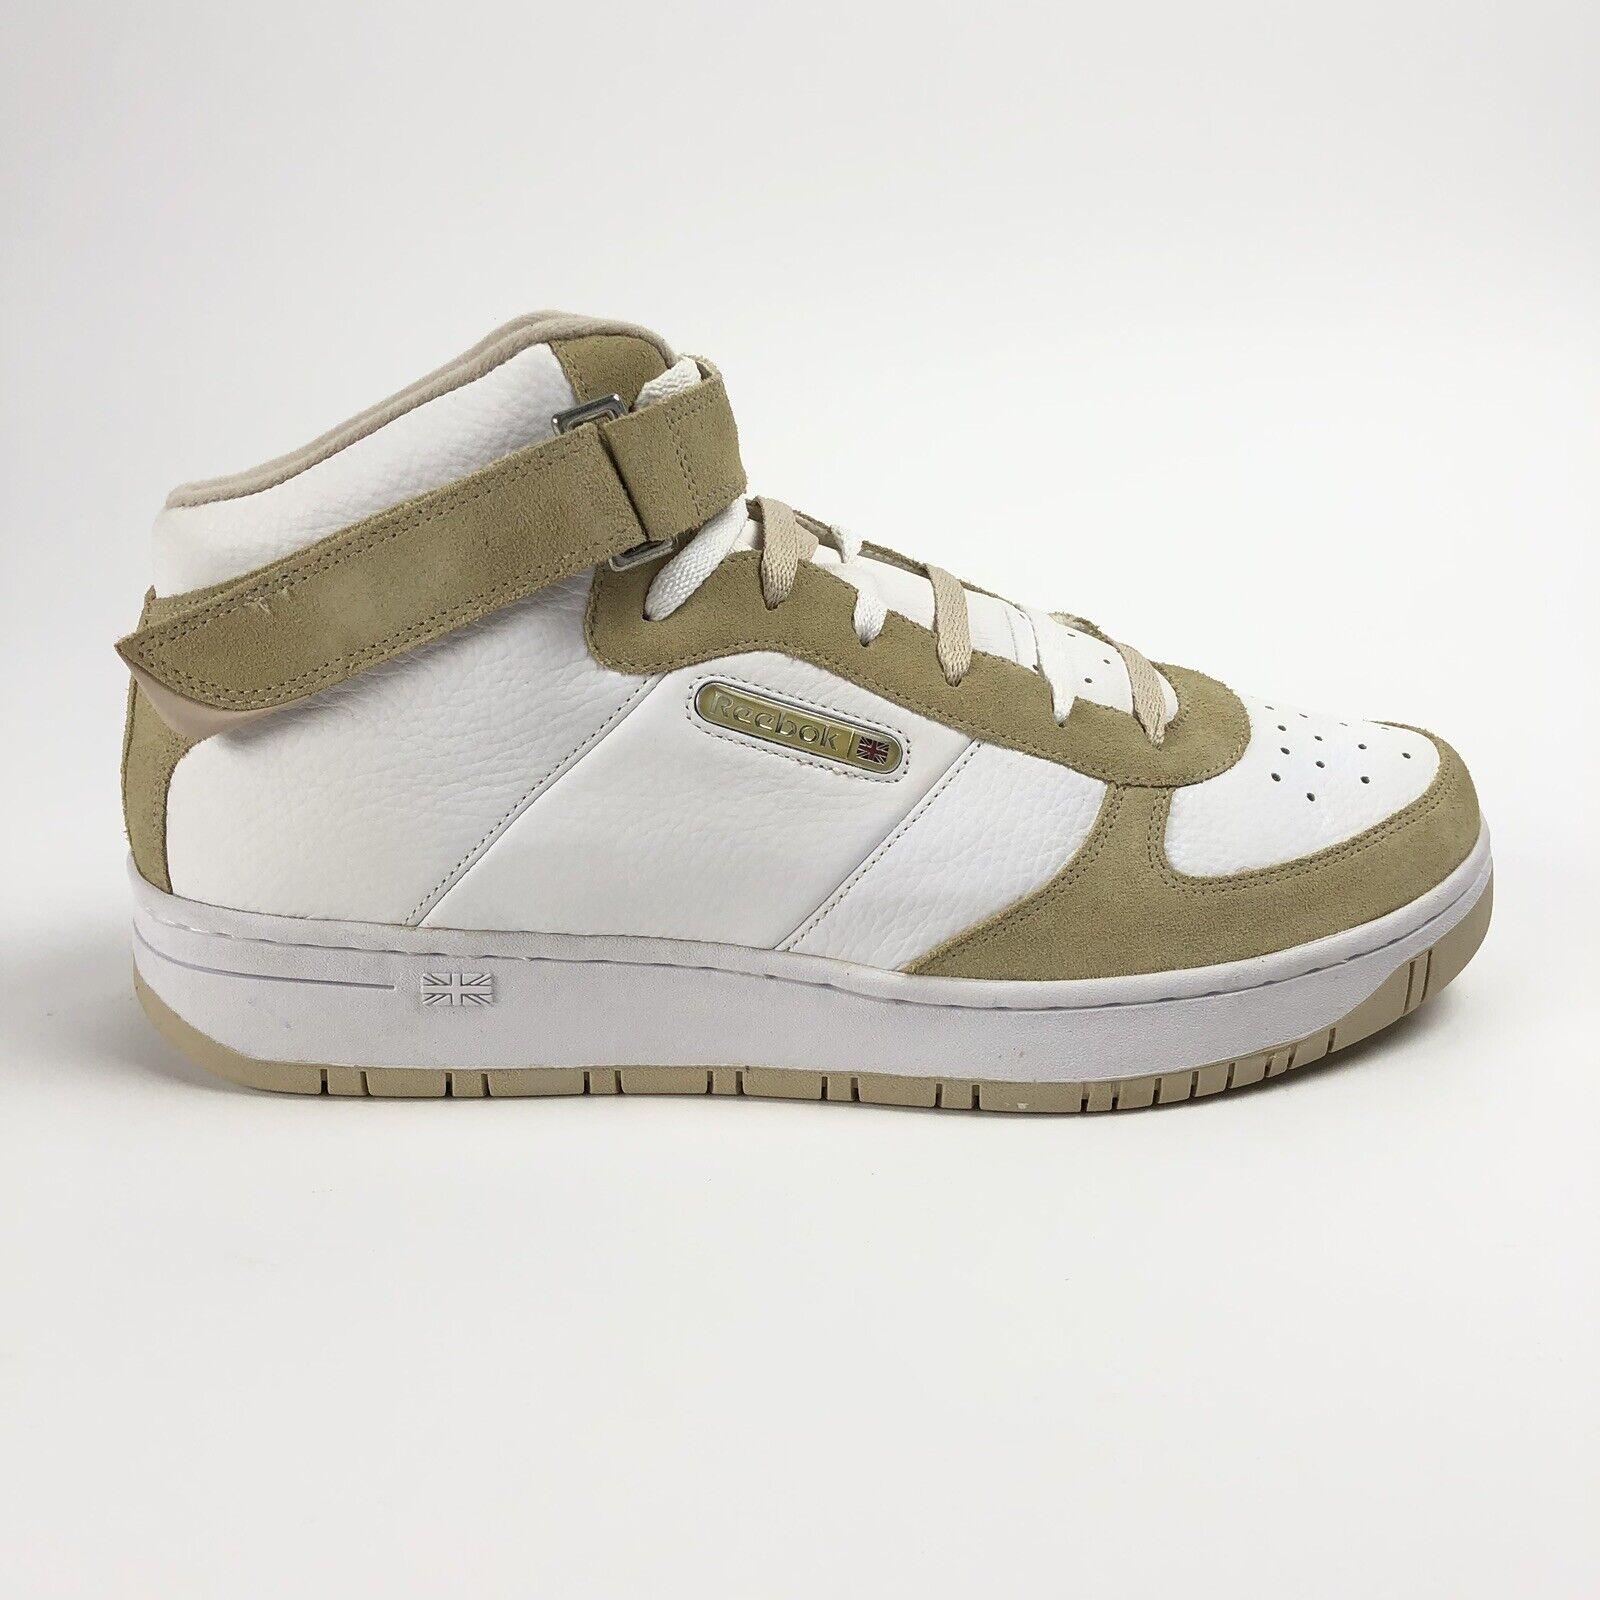 Reebok Classic Amaze Mediados Correa Para hombre Zapatos Tenis Retro 13 blancoo gris Topo 4-93825